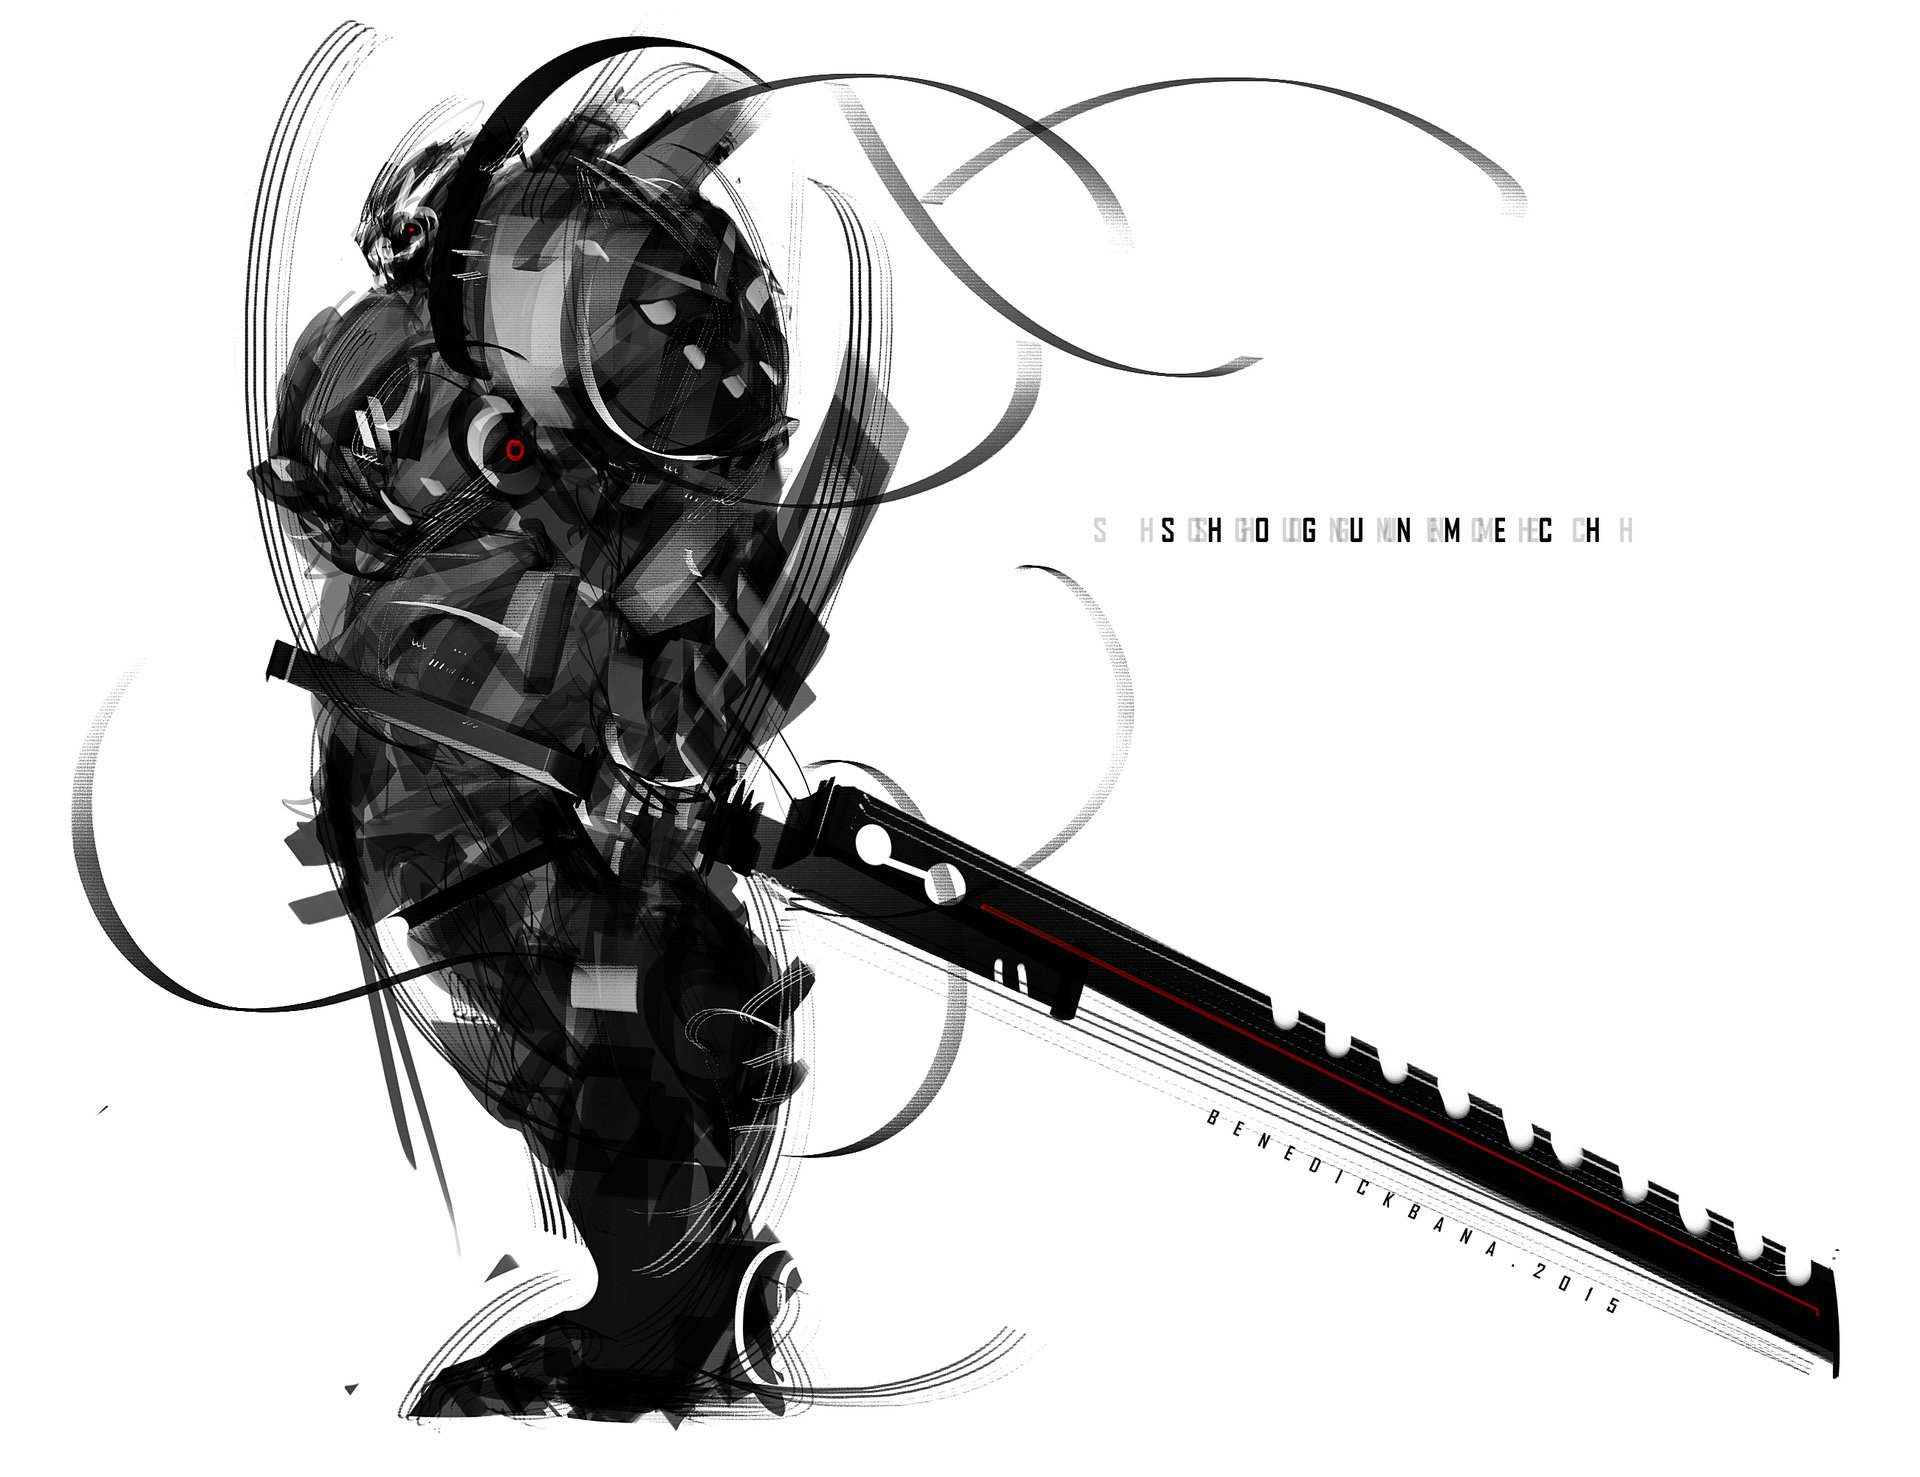 Benedick bana mech shogun2